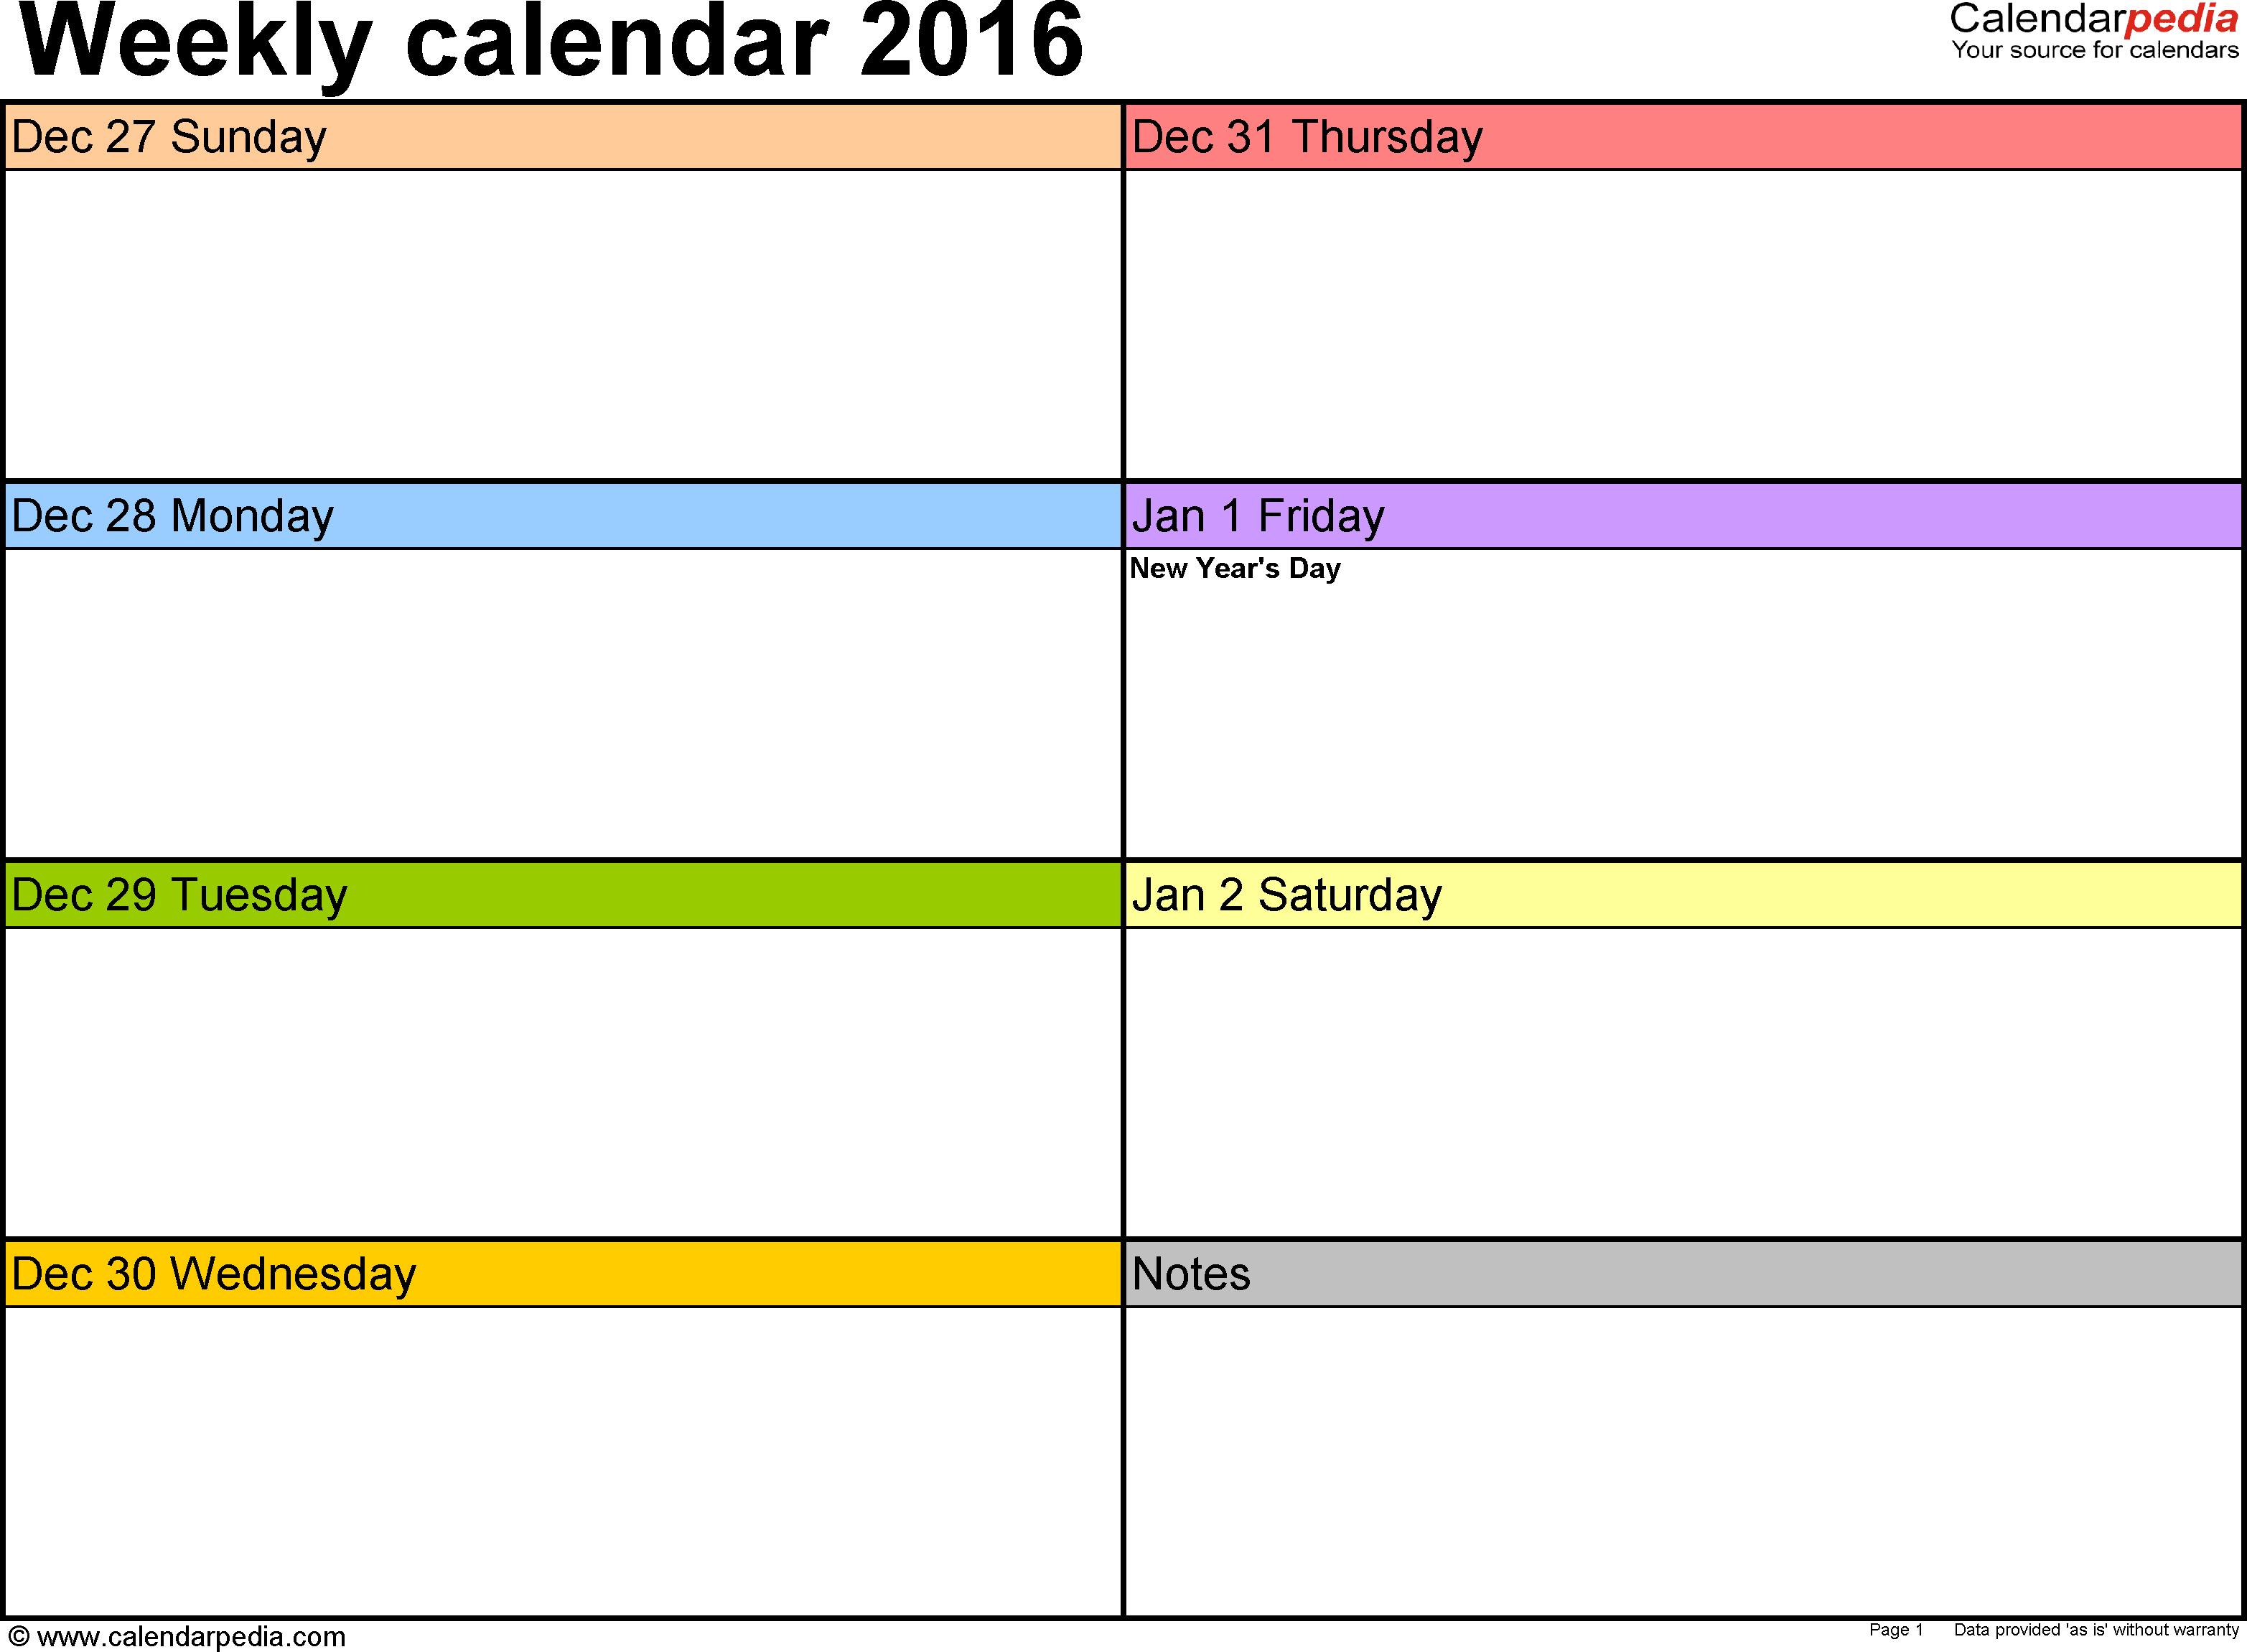 Weekly Calendar 2016: Template For Pdf Version 6, Landscape